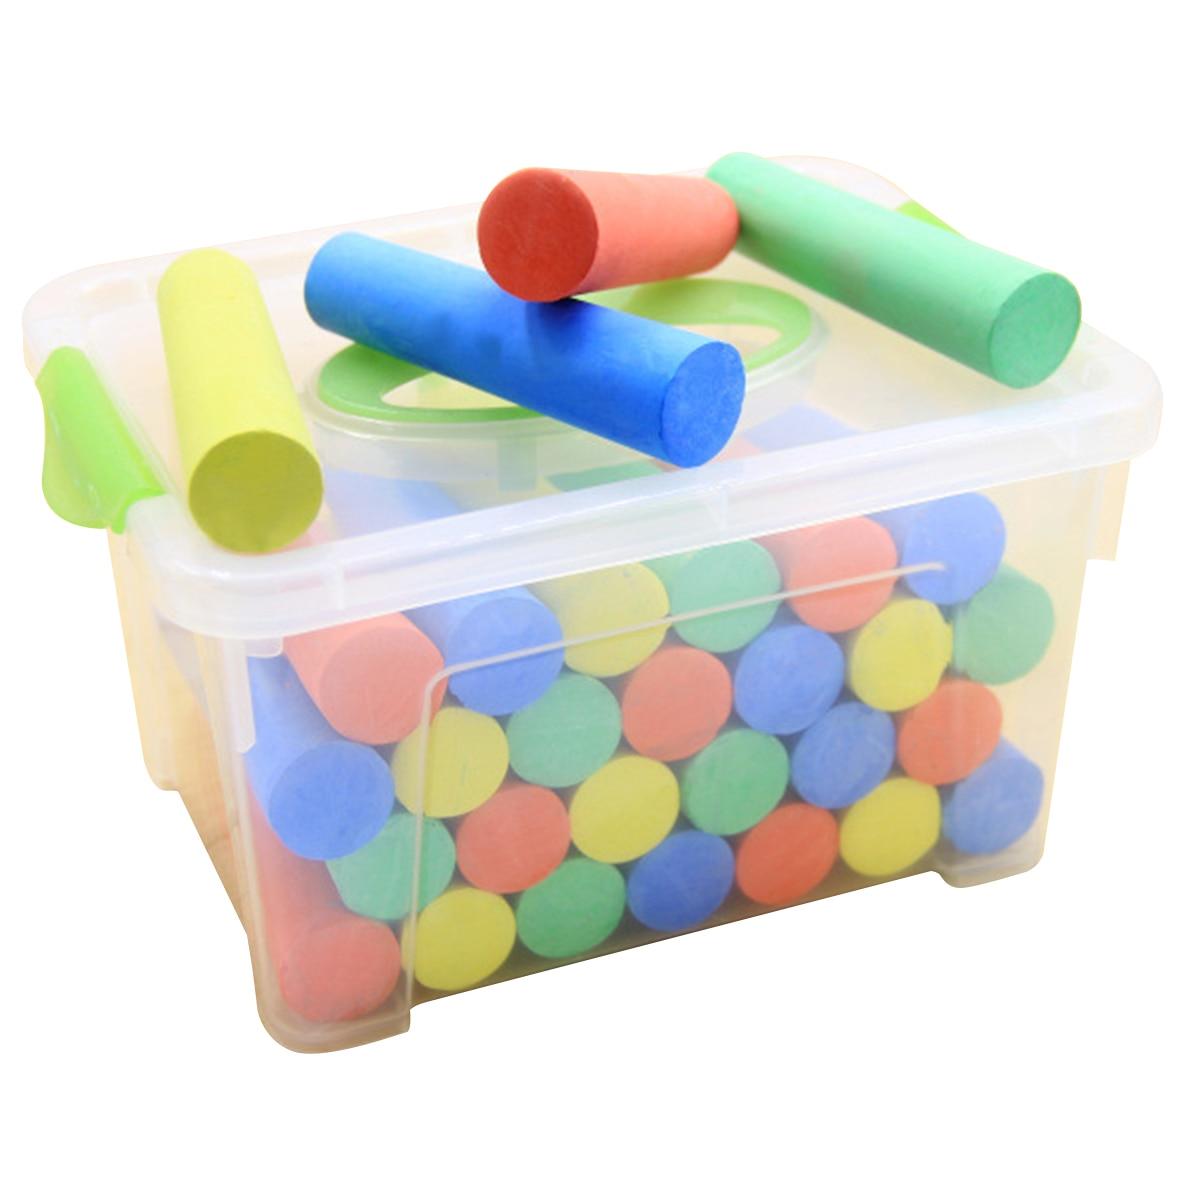 50pcs Big Fat Pastel Storage Box Sidewalk Chalk Set With Carry Box Washable Colored Chalk Makeup Tool Set